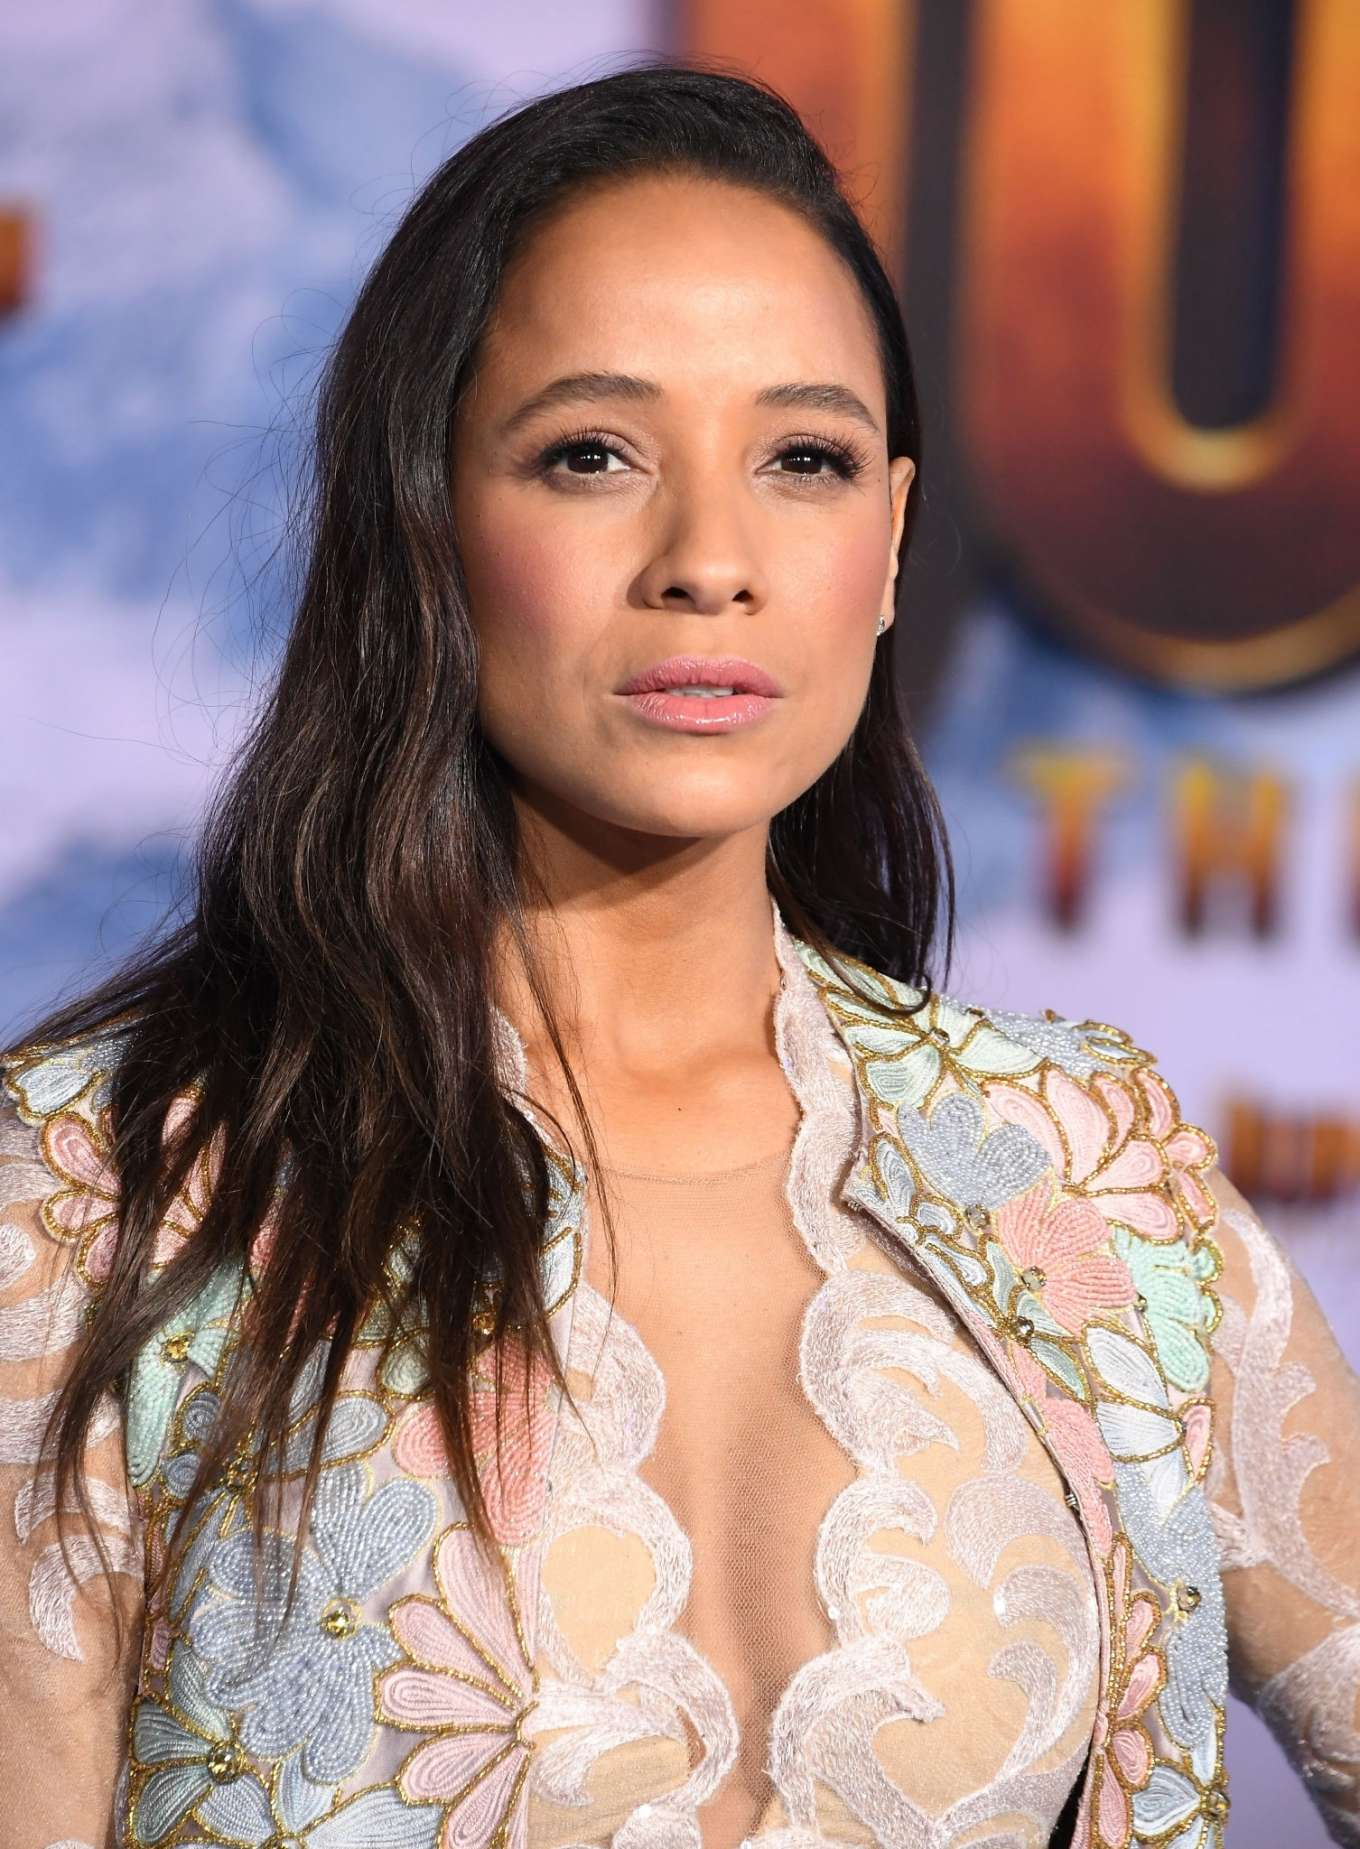 Dania Ramirez 2019 : Dania Ramirez – Jumanji: The Next Level premiere in Hollywood-23